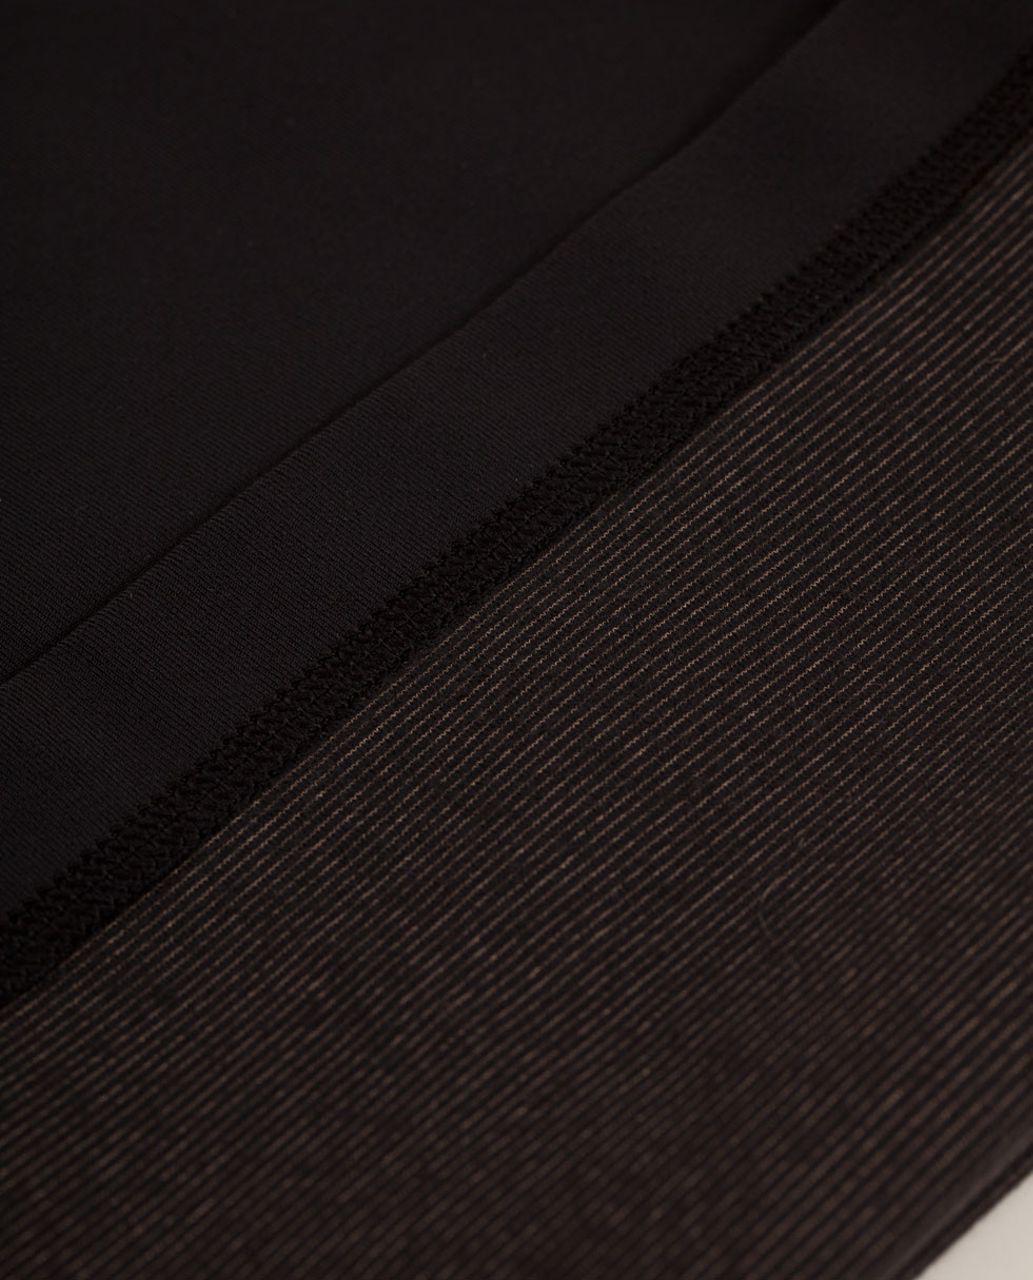 Lululemon Groove Pant *Silver Slim (Regular) - Black /  Quilting Winter 16